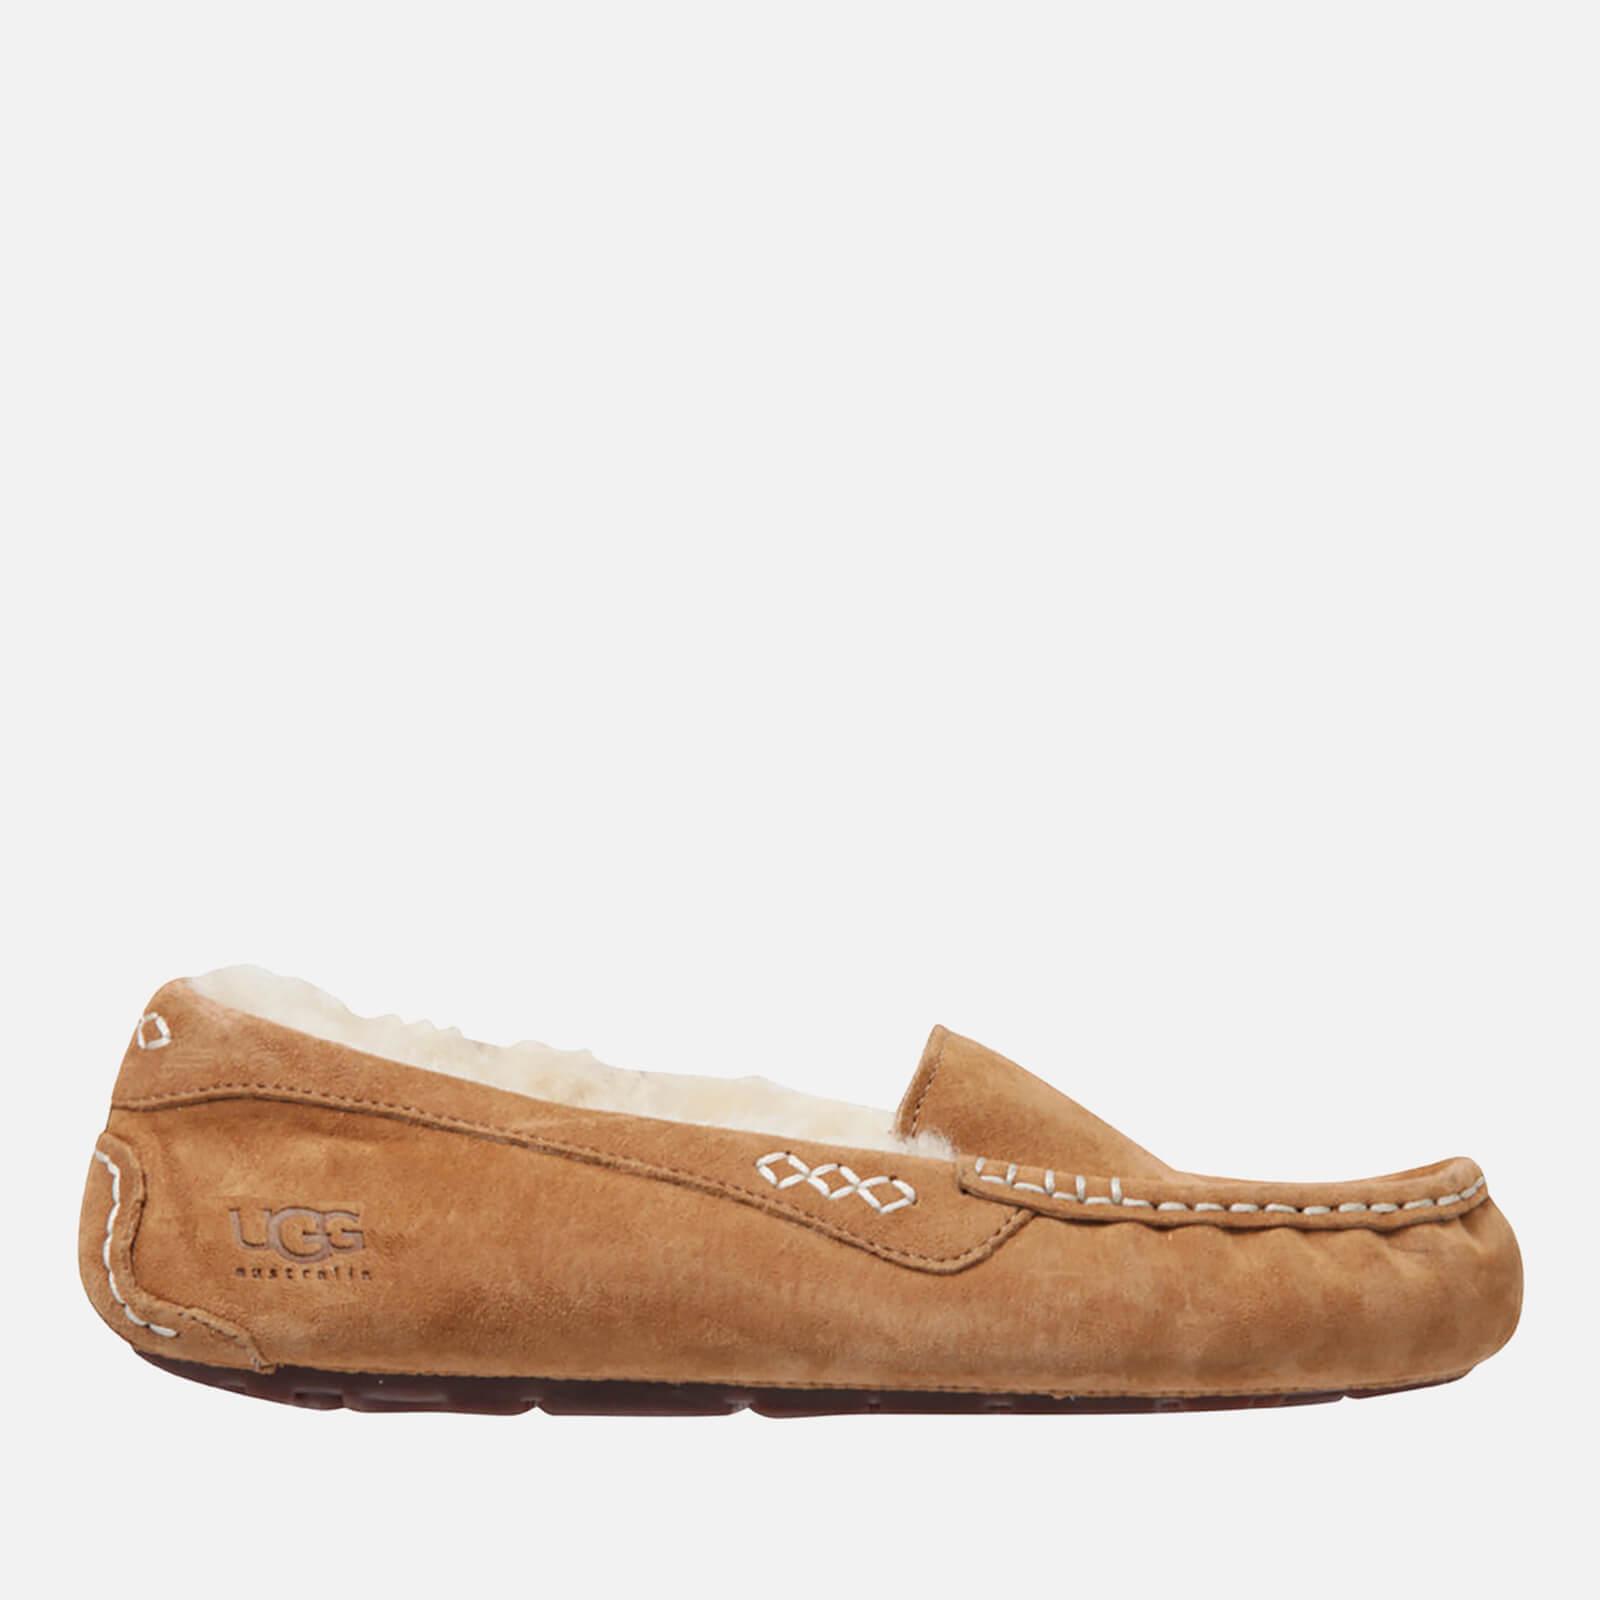 UGG Women's Ansley Moccasin Suede Slippers - Chestnut - UK 3